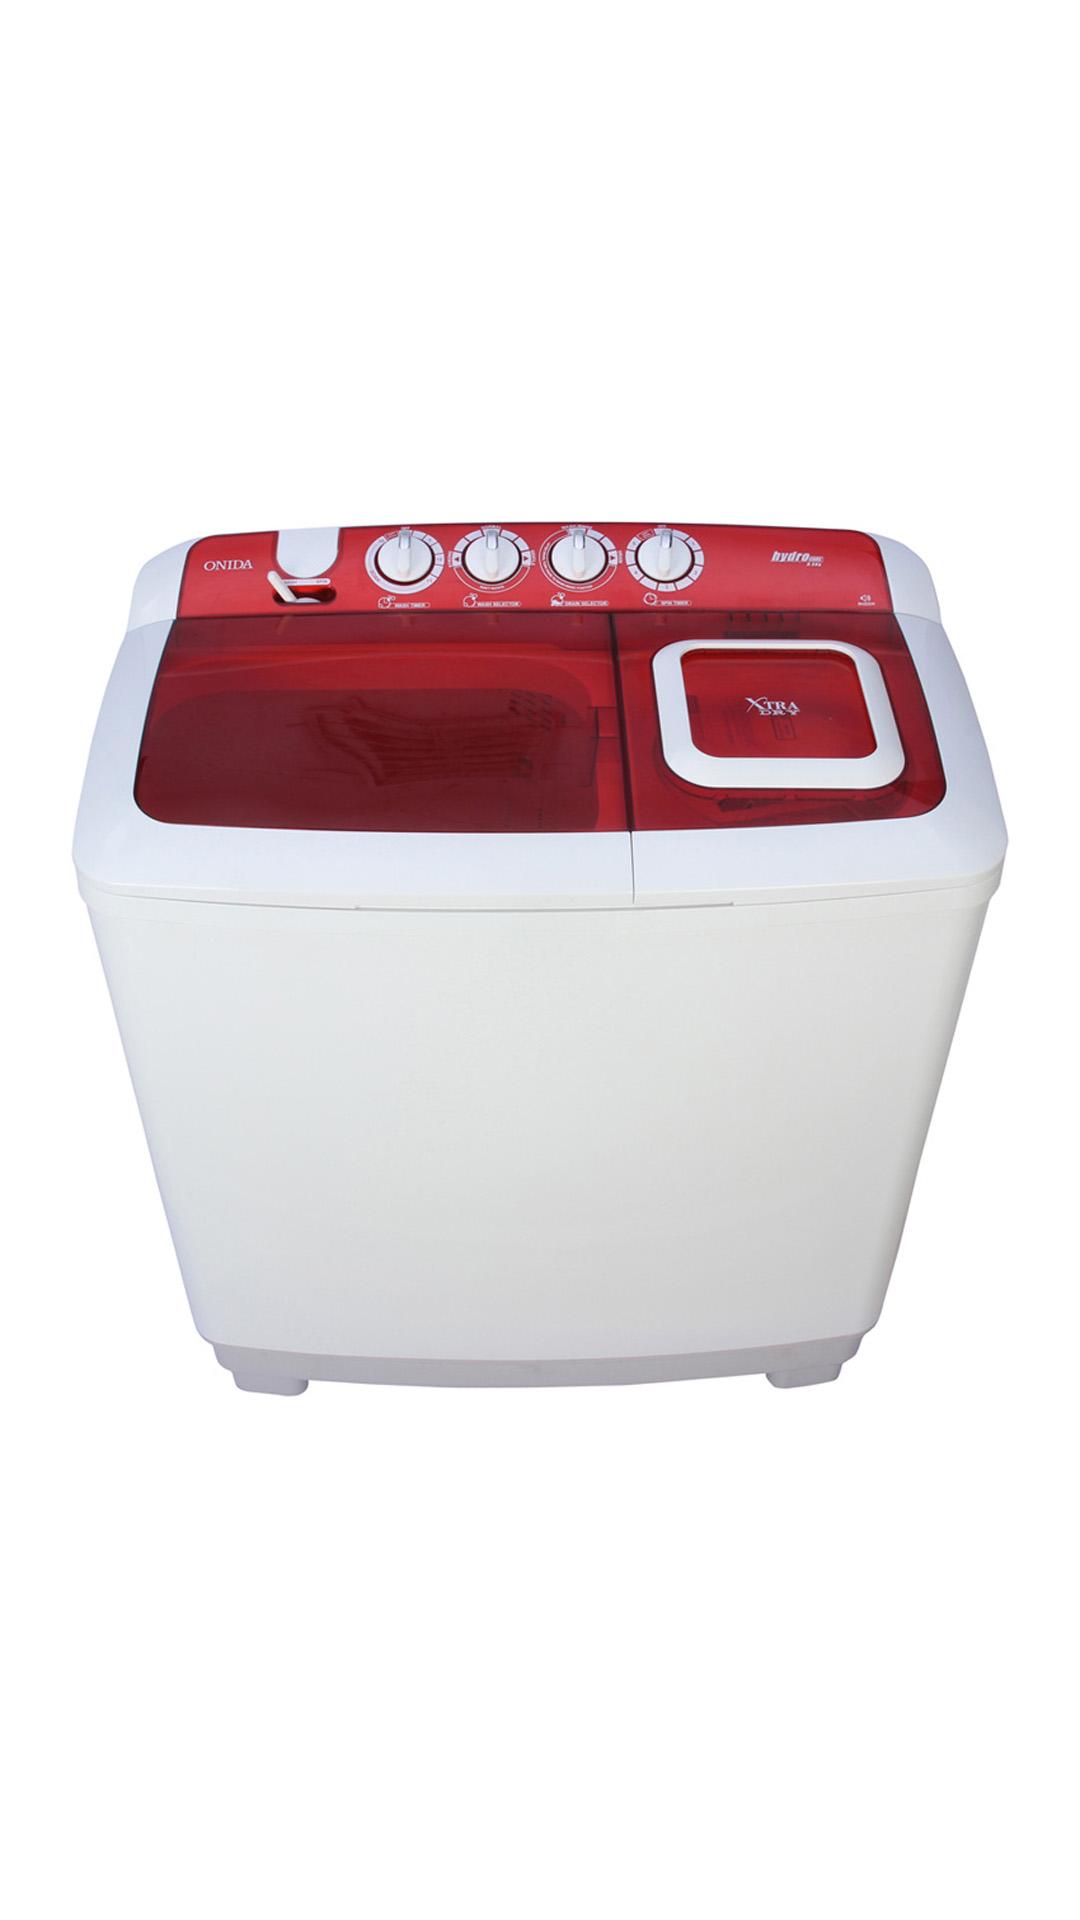 Onida 85S Semi Automatic Top Loading 8.5 kg Washing Machine